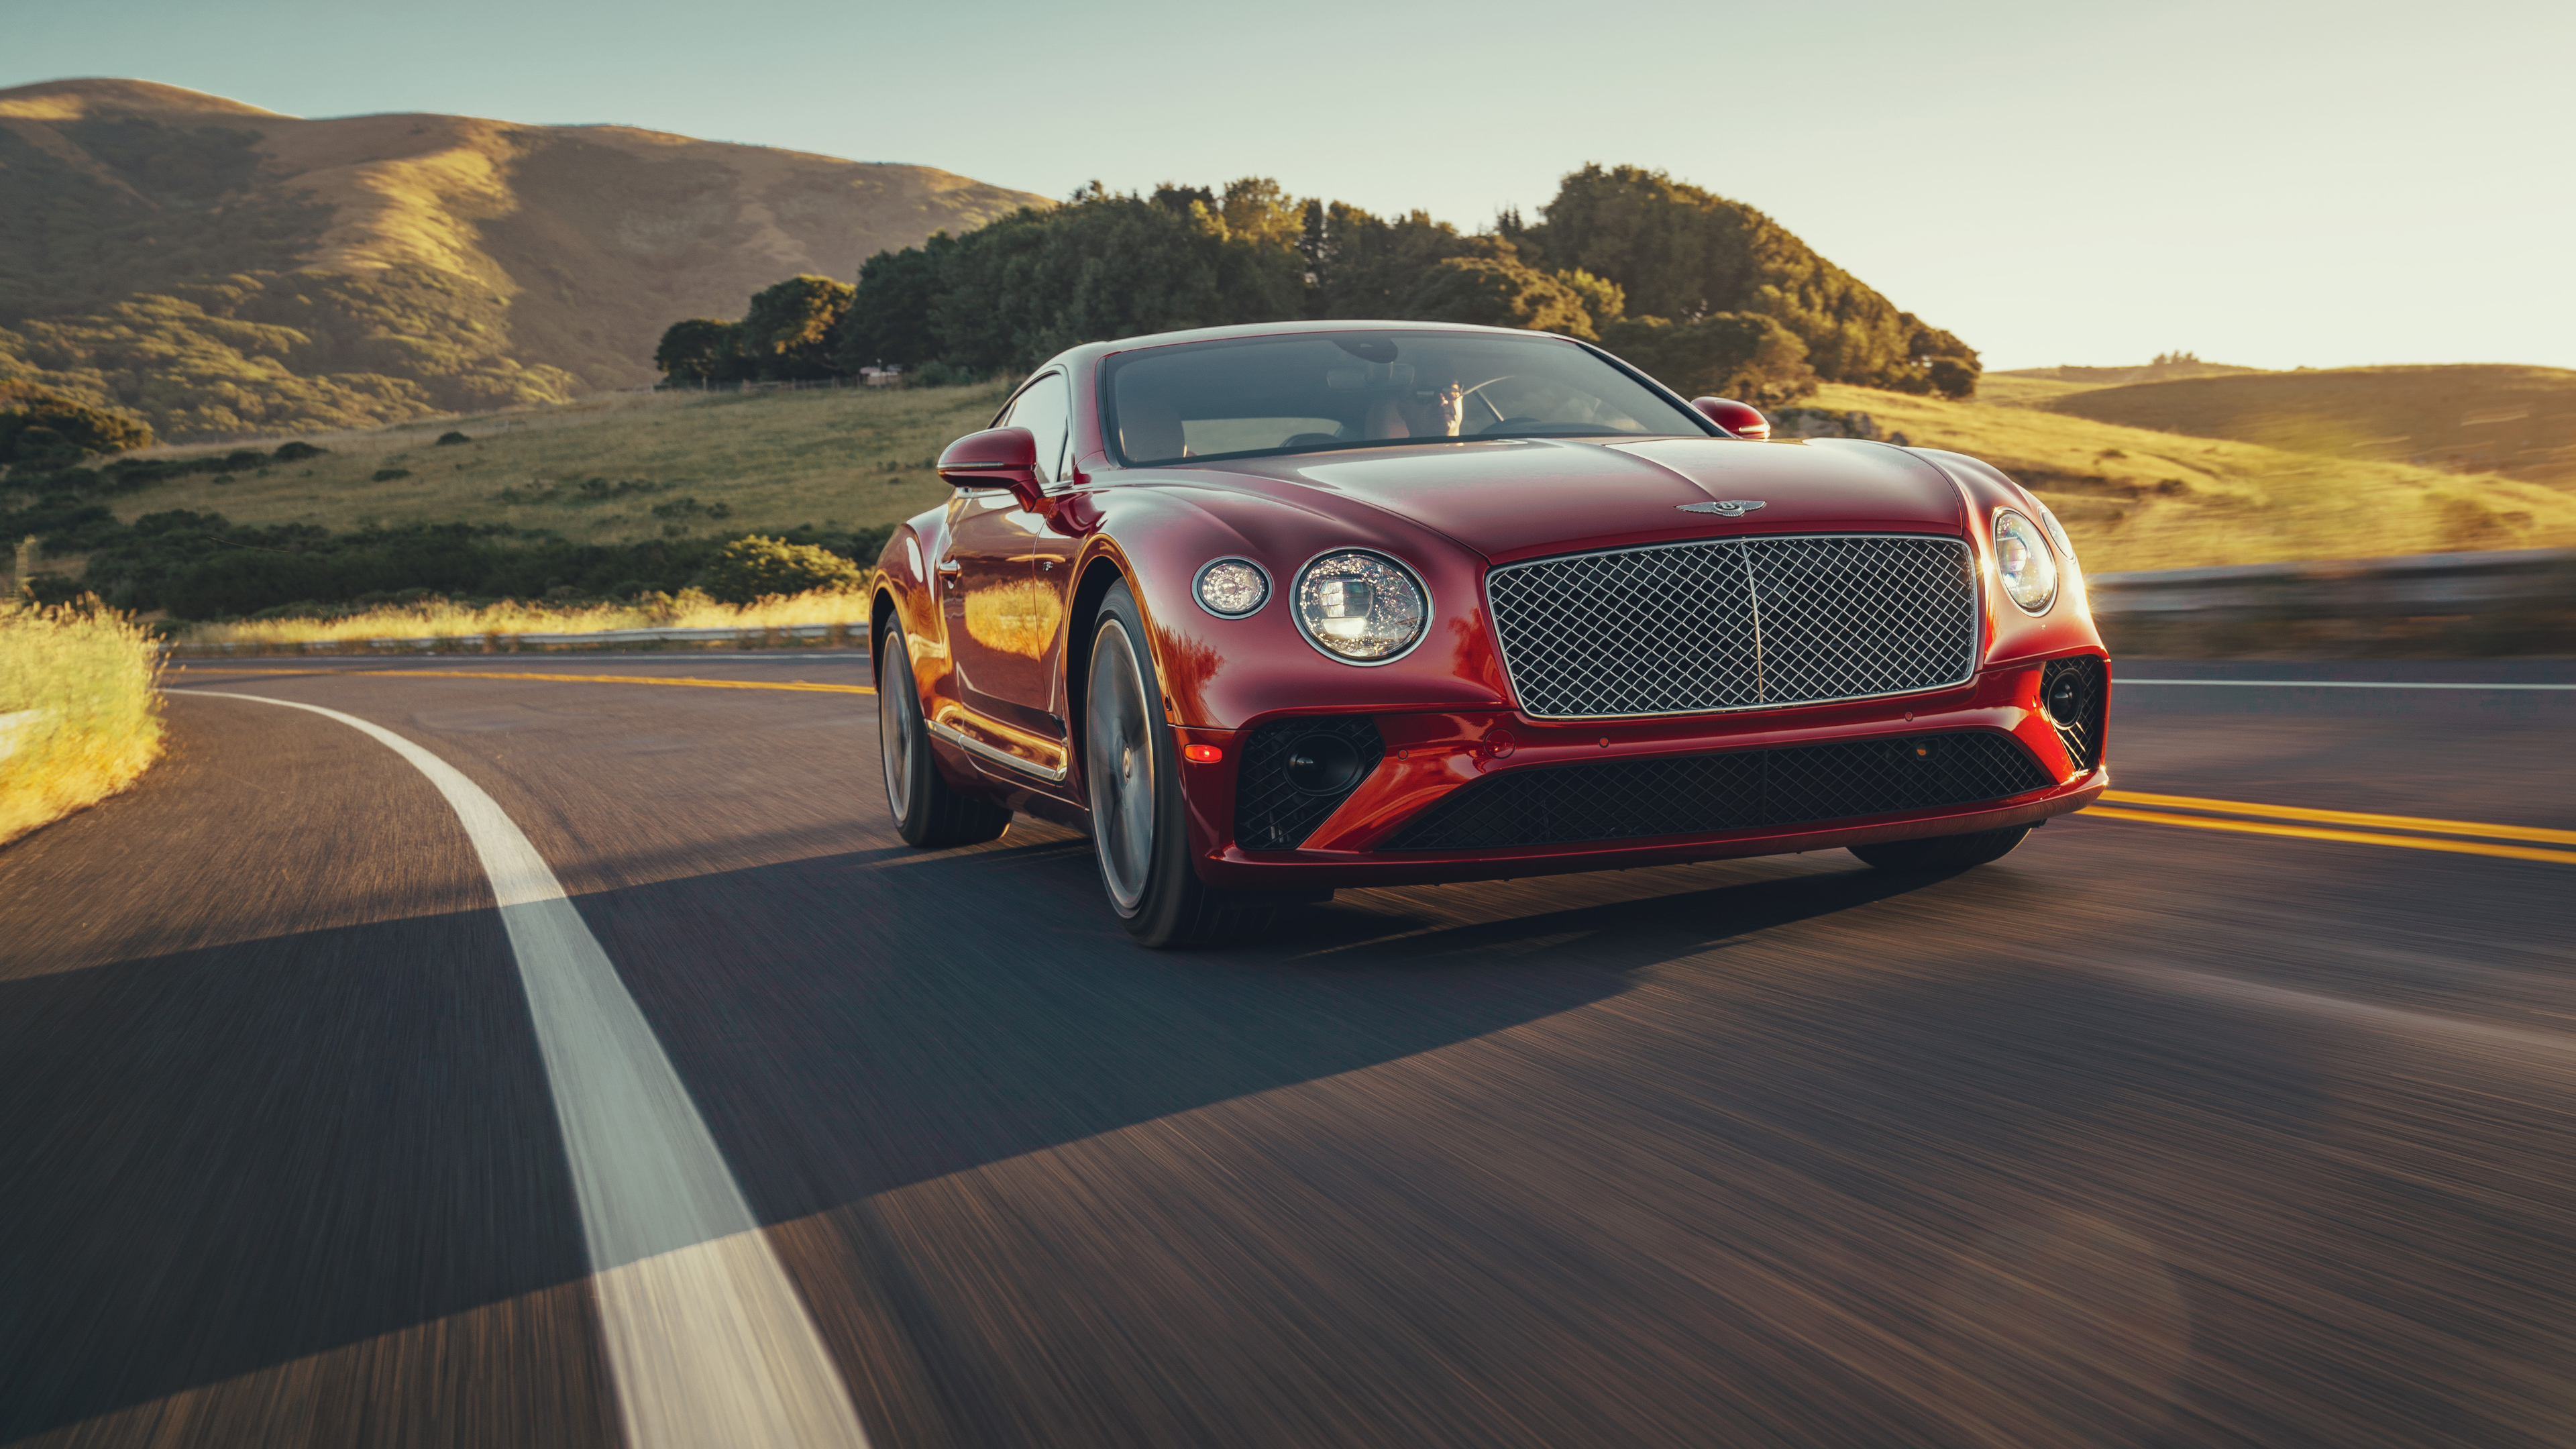 bentley continental gt v8 2020 1562108276 - Bentley Continental GT V8 2020 - hd-wallpapers, bentley wallpapers, bentley continental wallpapers, bentley continental gt3 wallpapers, 5k wallpapers, 4k-wallpapers, 2020 cars wallpapers